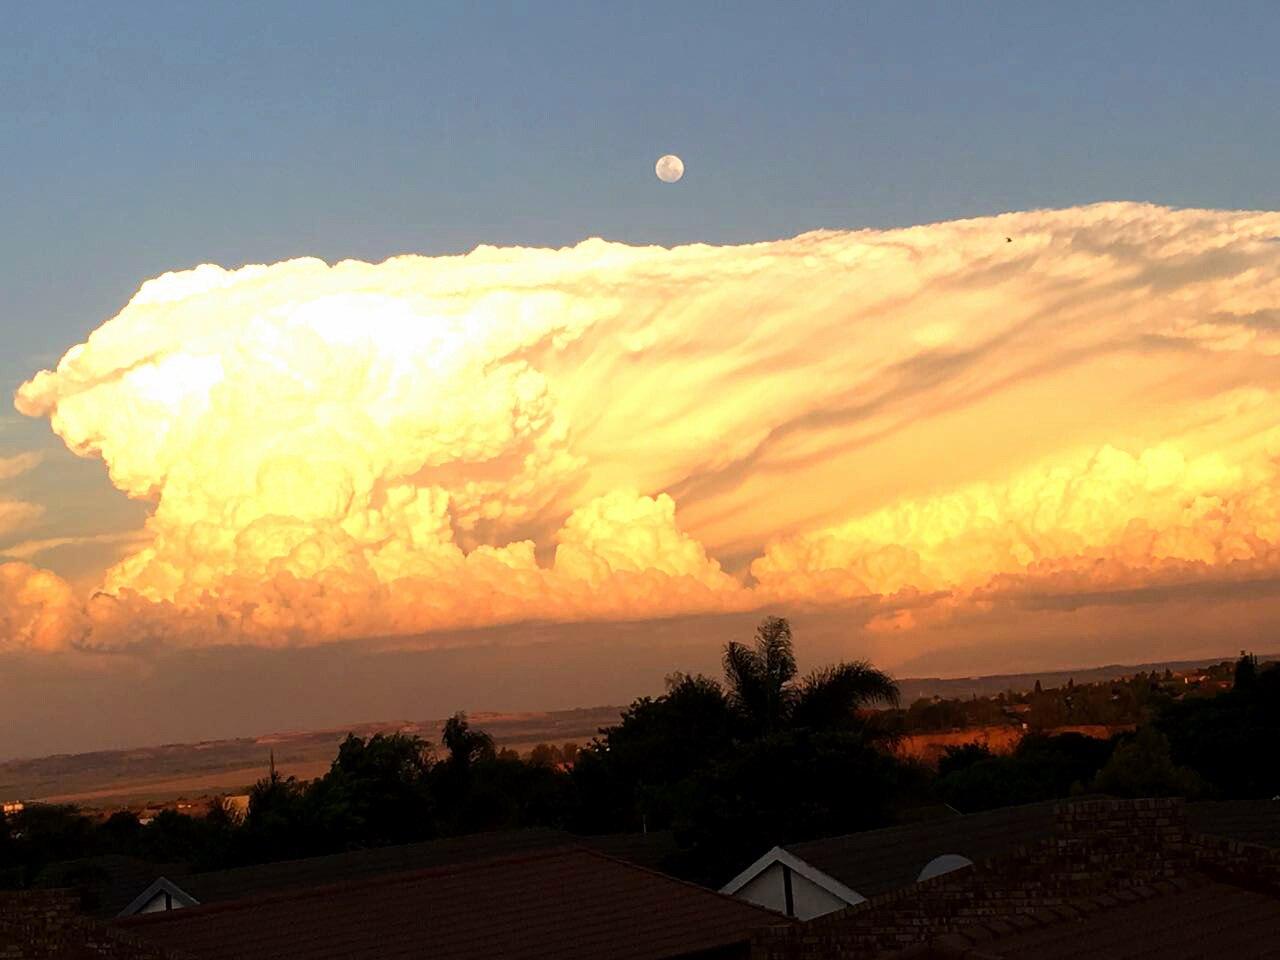 cloud, cumulonimbus, cumulonimbus cloud, cumulonimbus cloud south africa, sa cumulonimbus cloud Mpumalanga